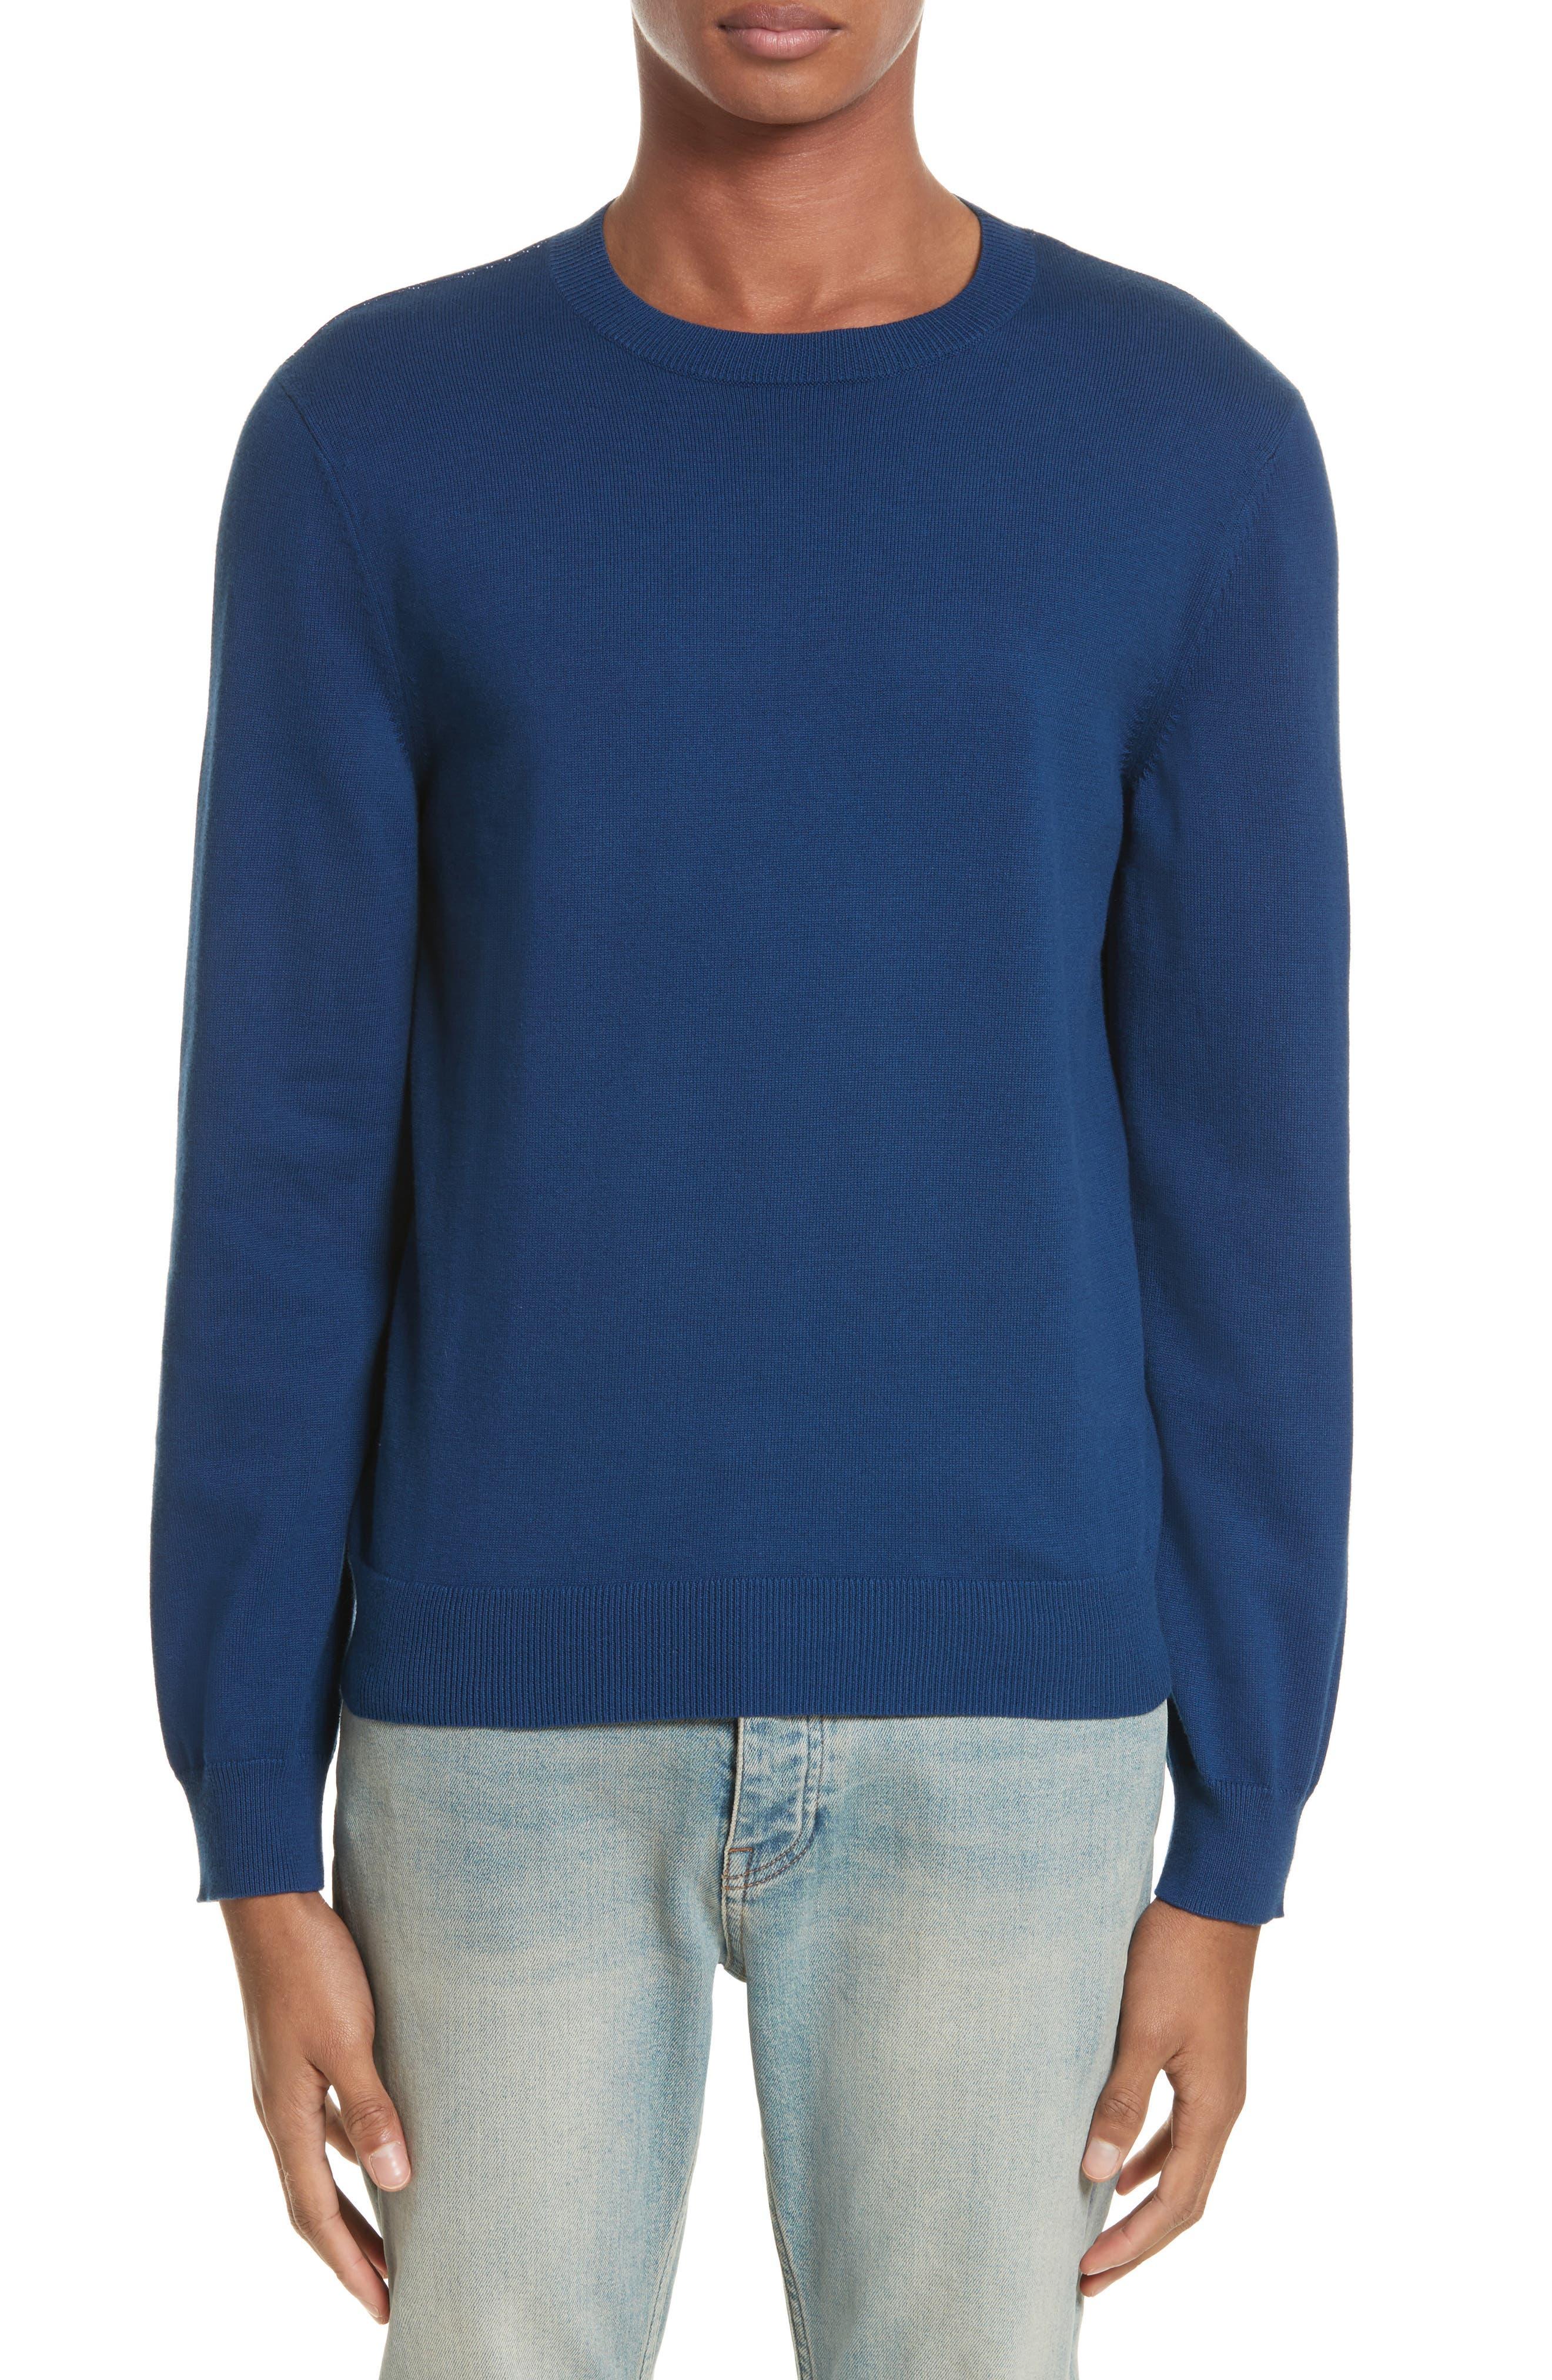 Main Image - A.P.C. CIA Crewneck Sweater